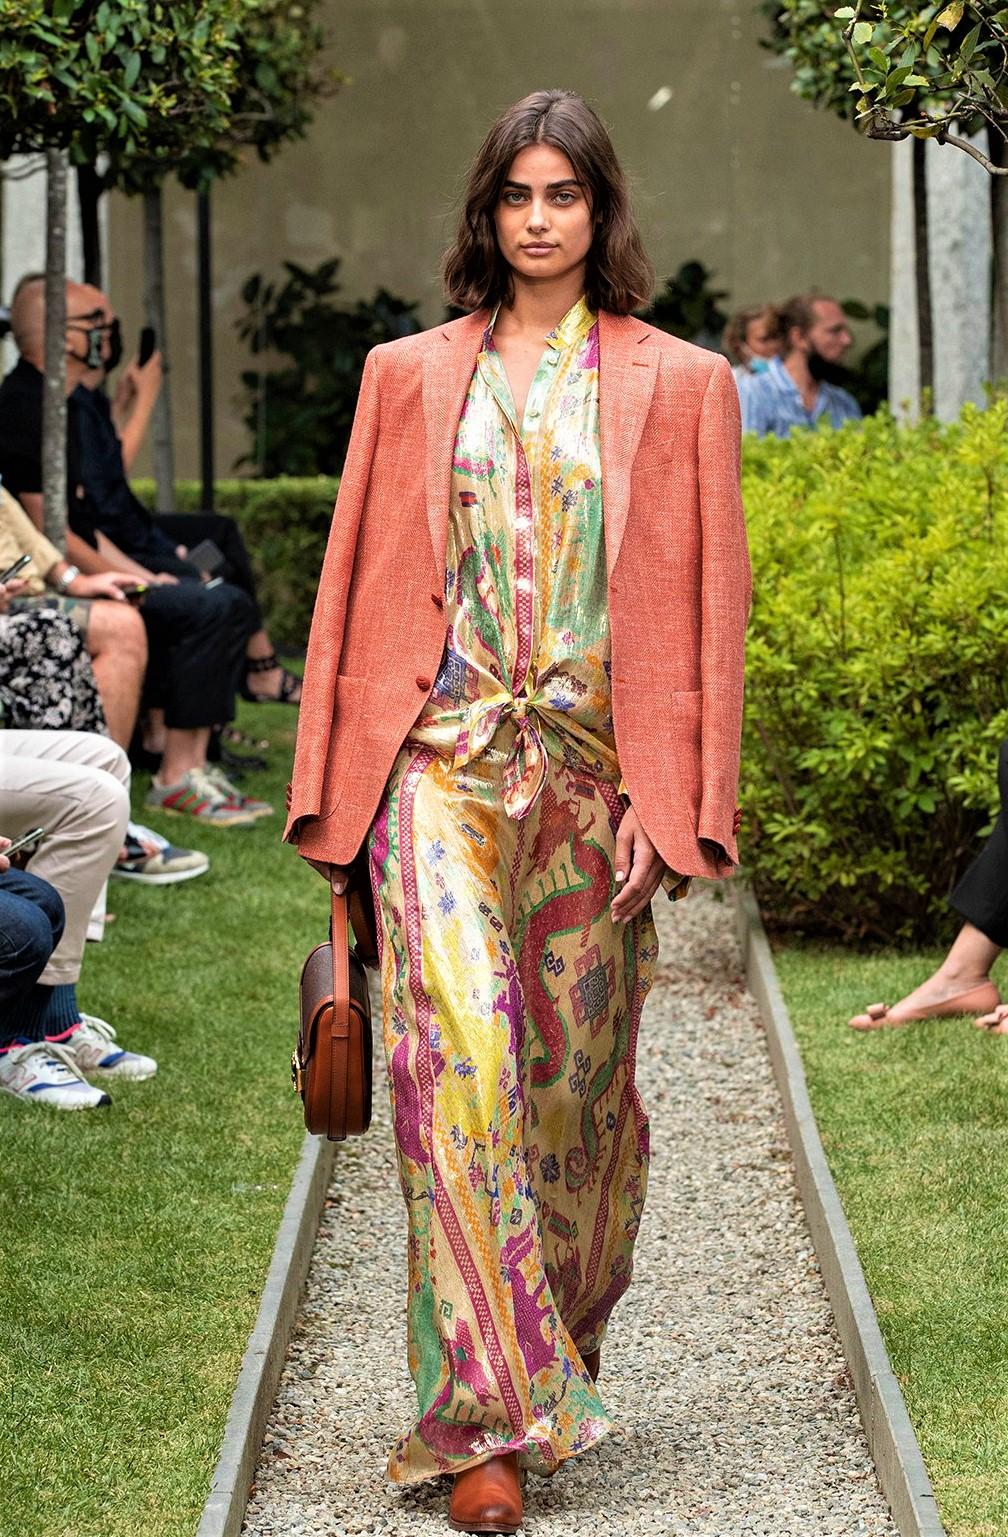 etro womenswear silk coral jkt milan fashion week pynck (2) cropped.jpg